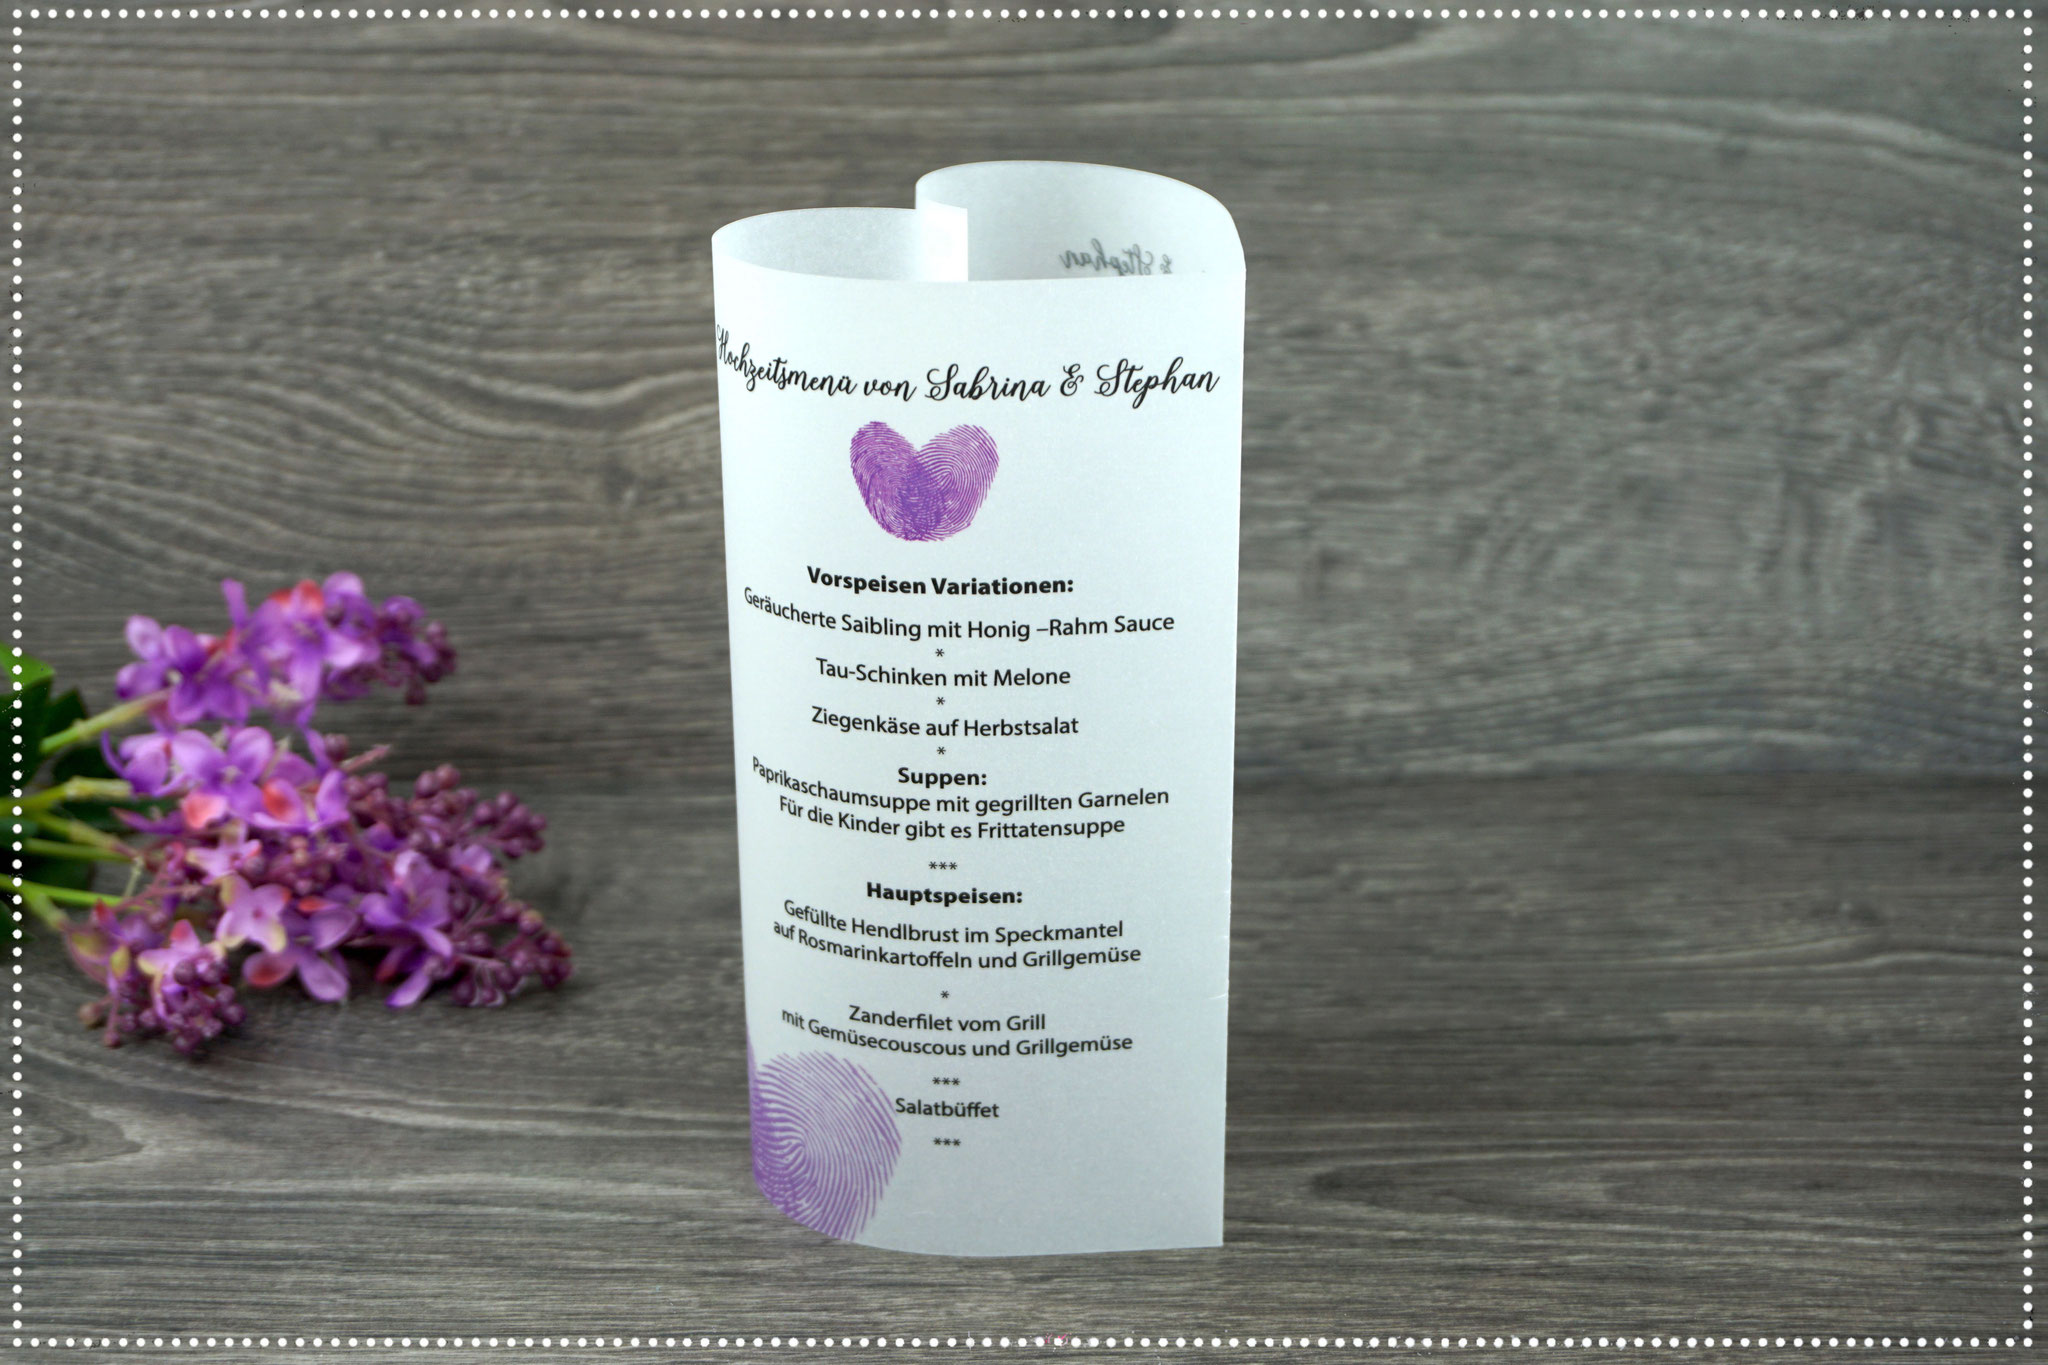 Menükarte Design Fingerprint, Farbe lila, Schrift Shania Script